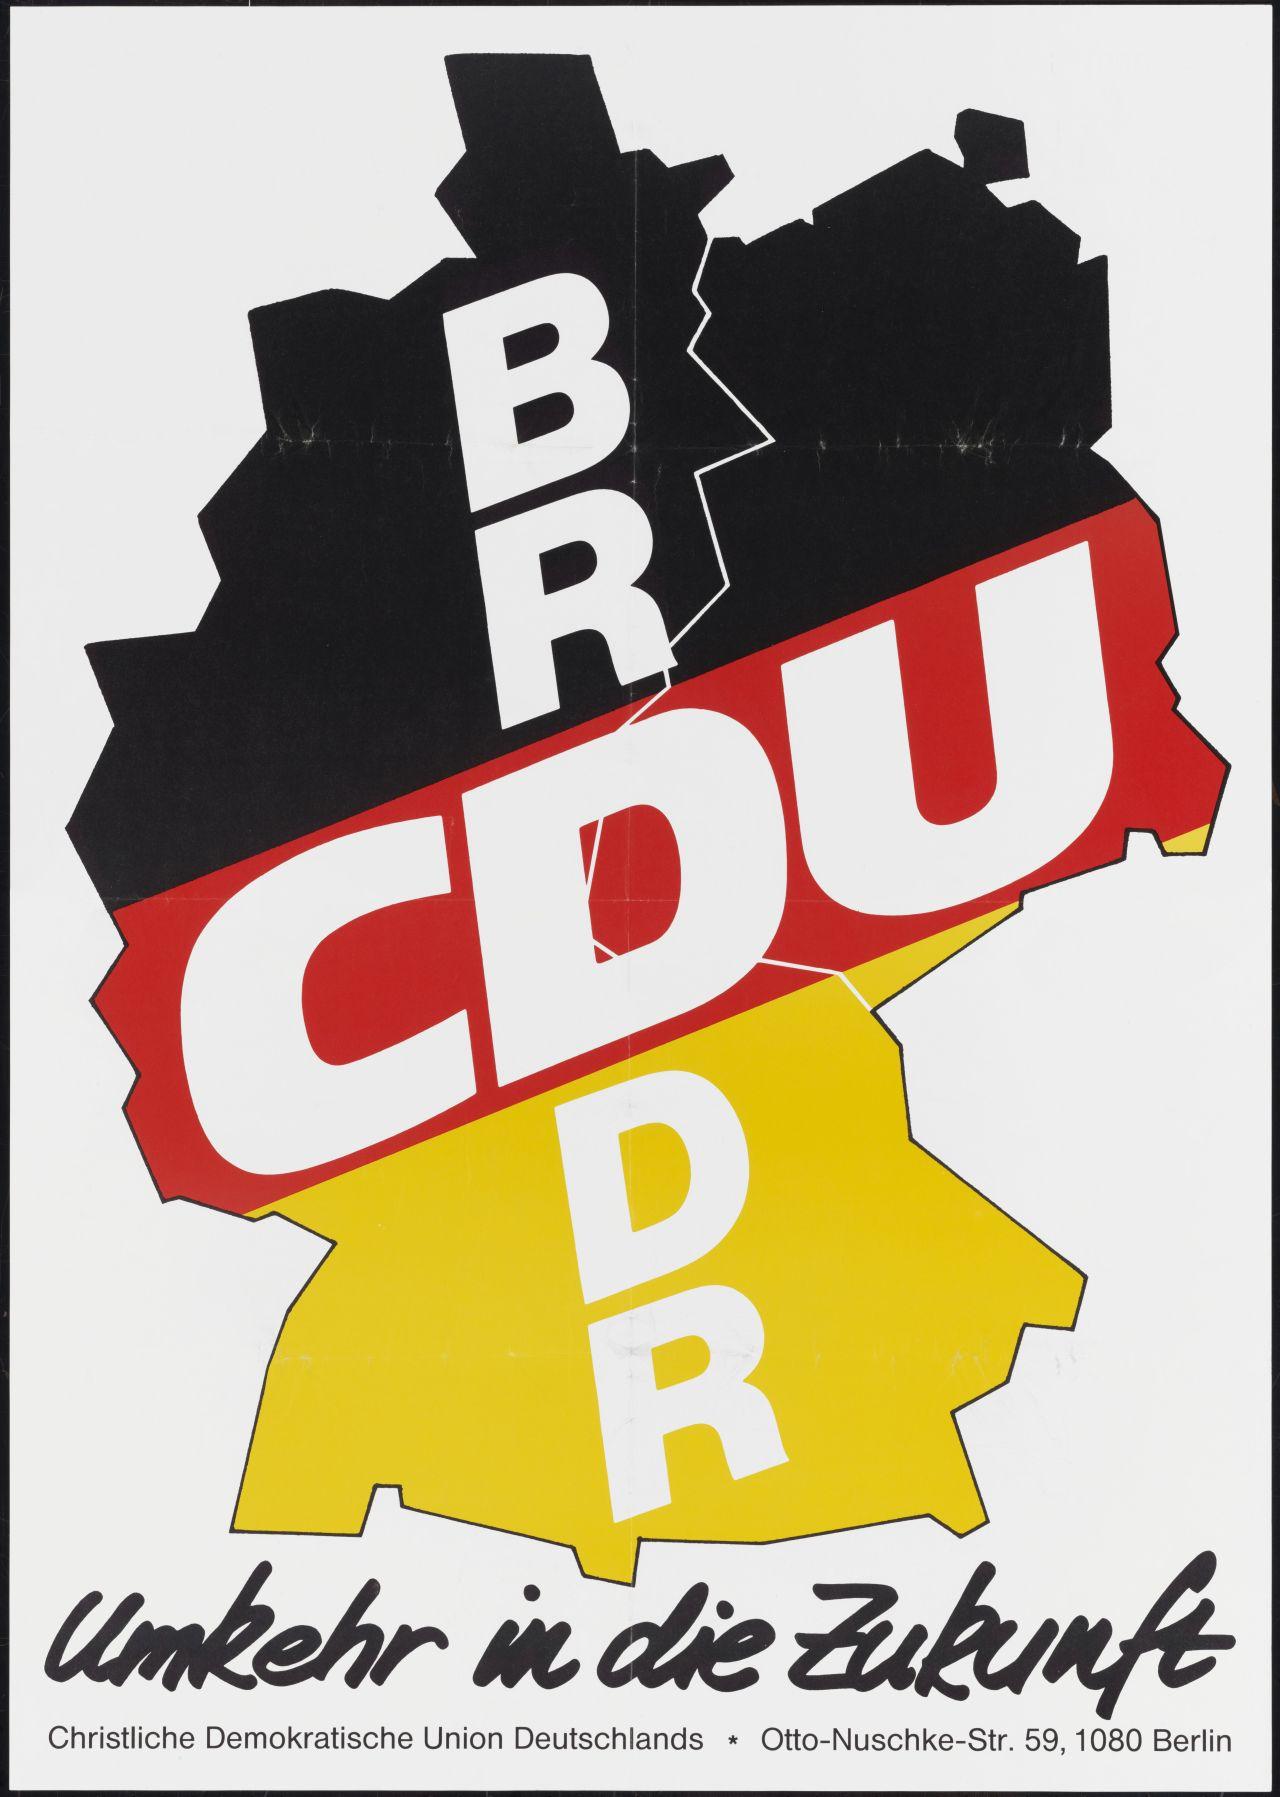 Cdu Wahlplakat 1991 Fake